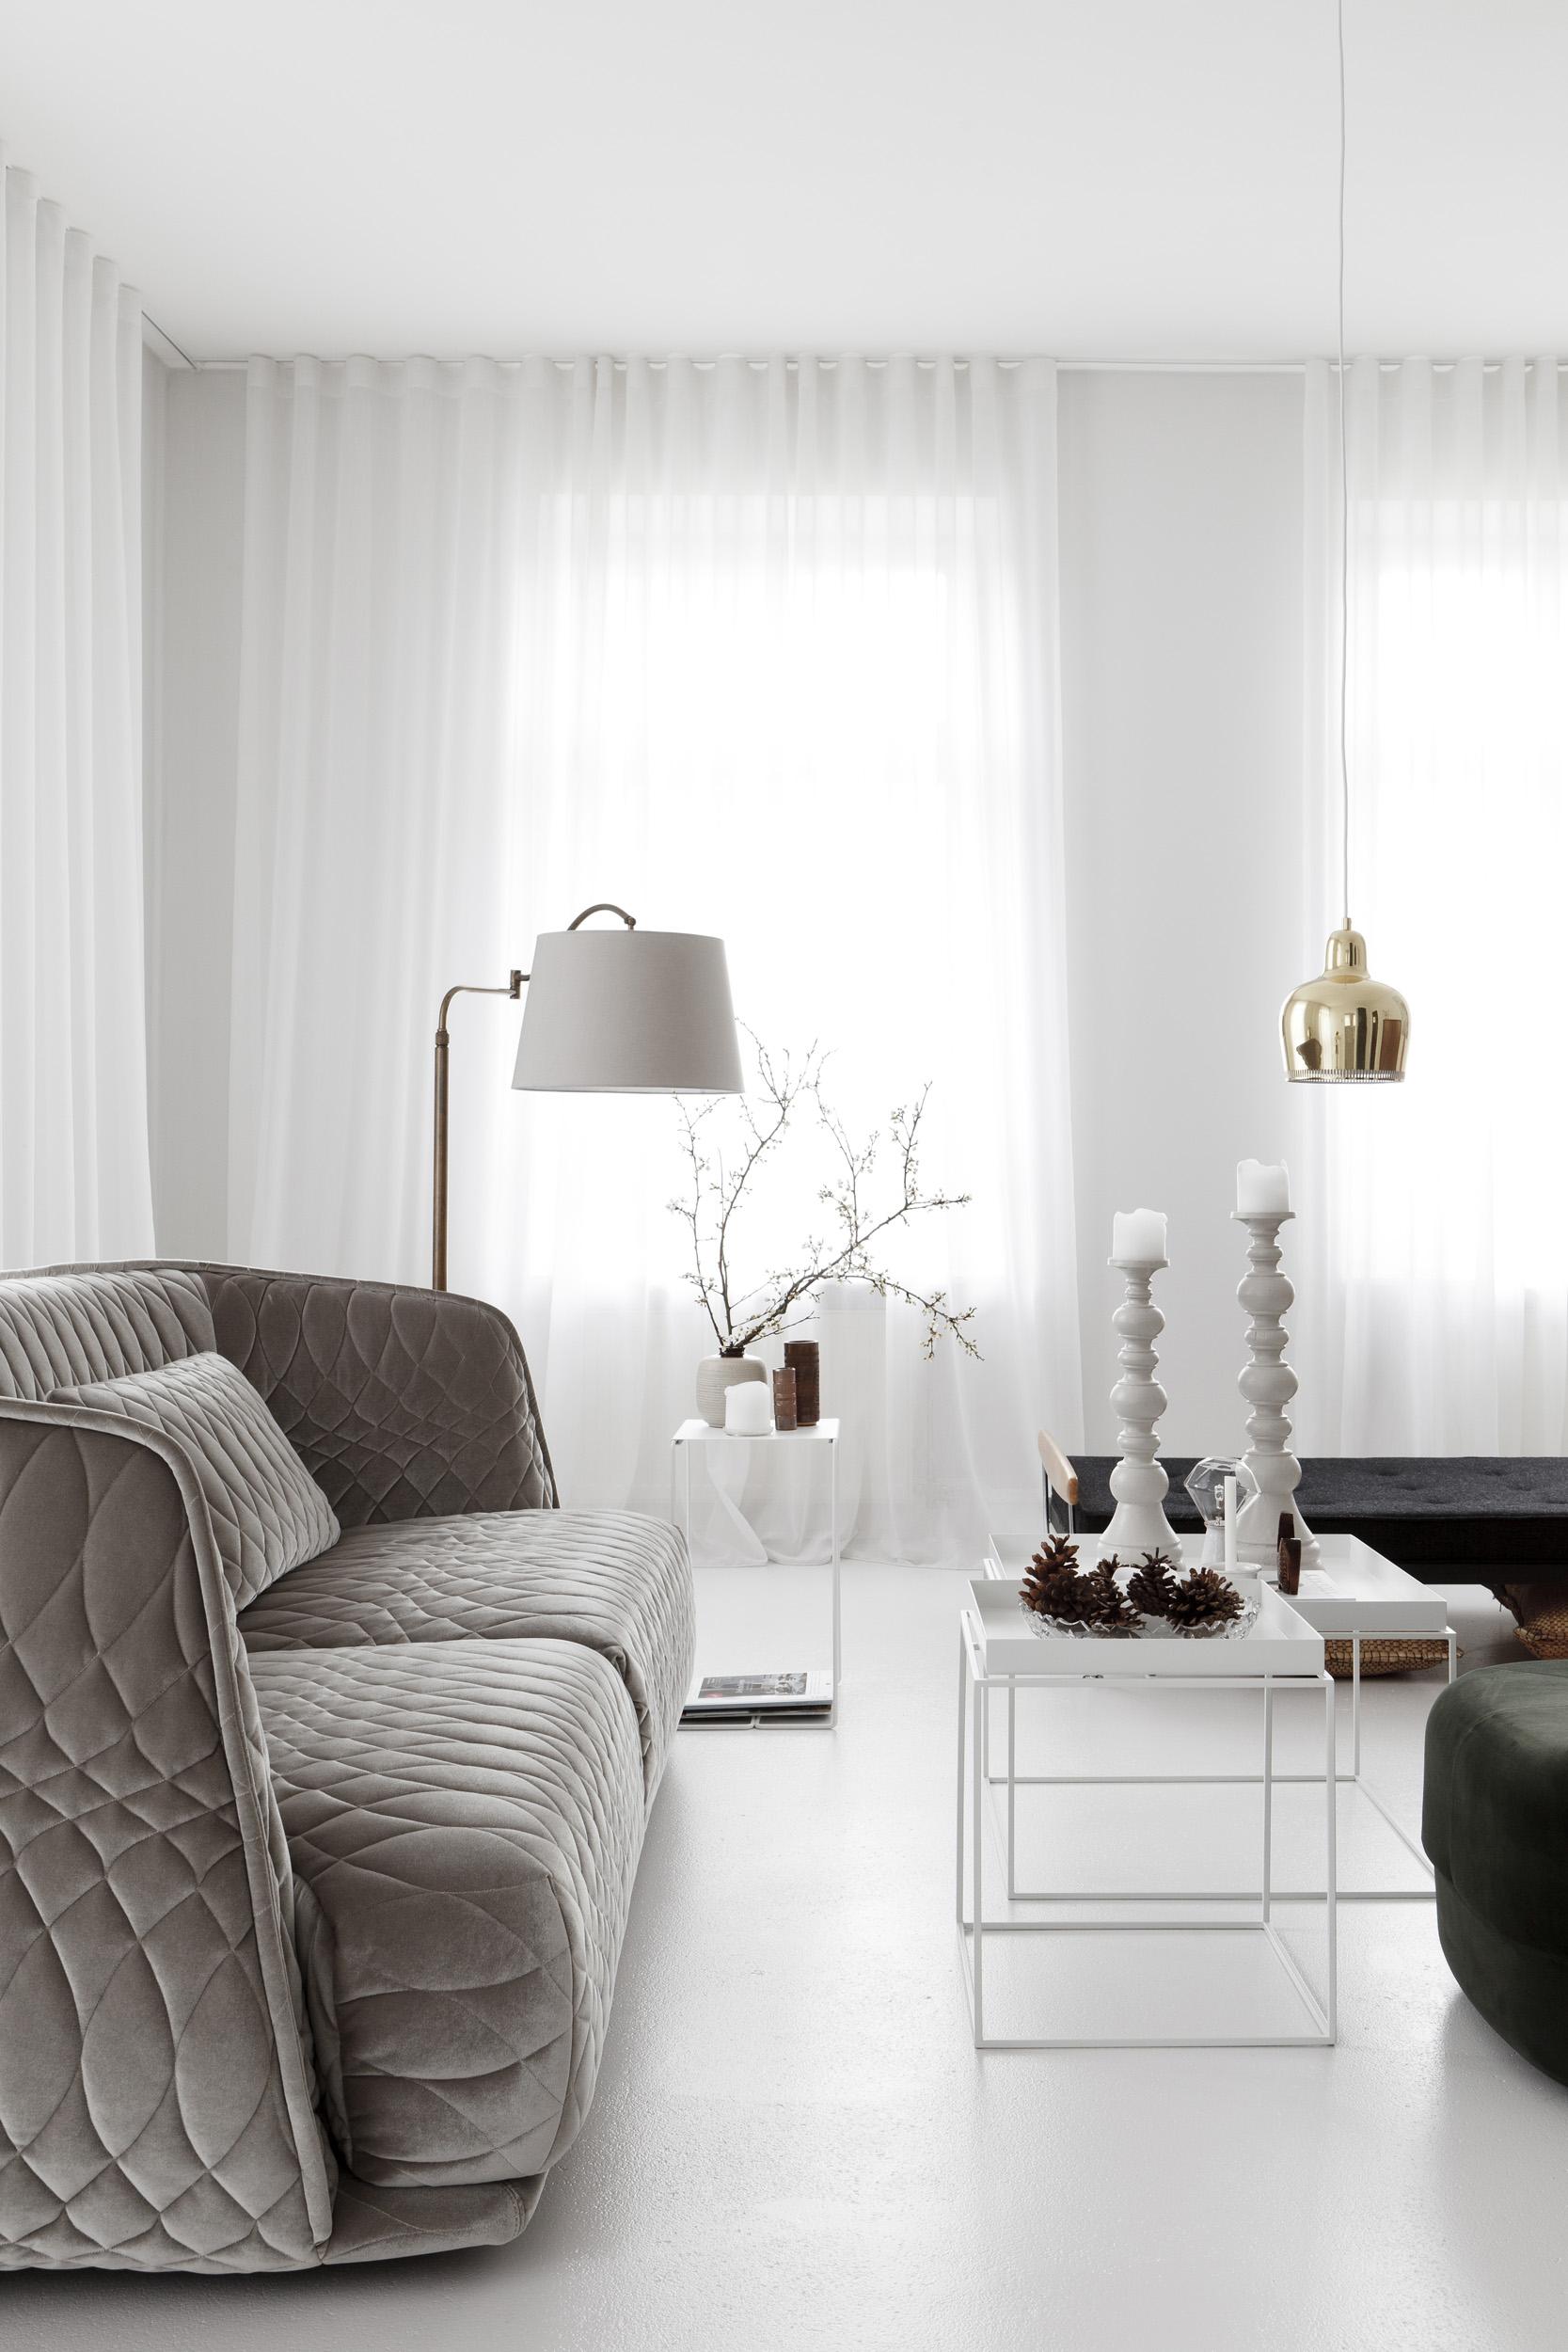 Studio-Oink-House-Cal-II-apartment-remodel-Mainz-Germany-Remodelista-1F.jpg